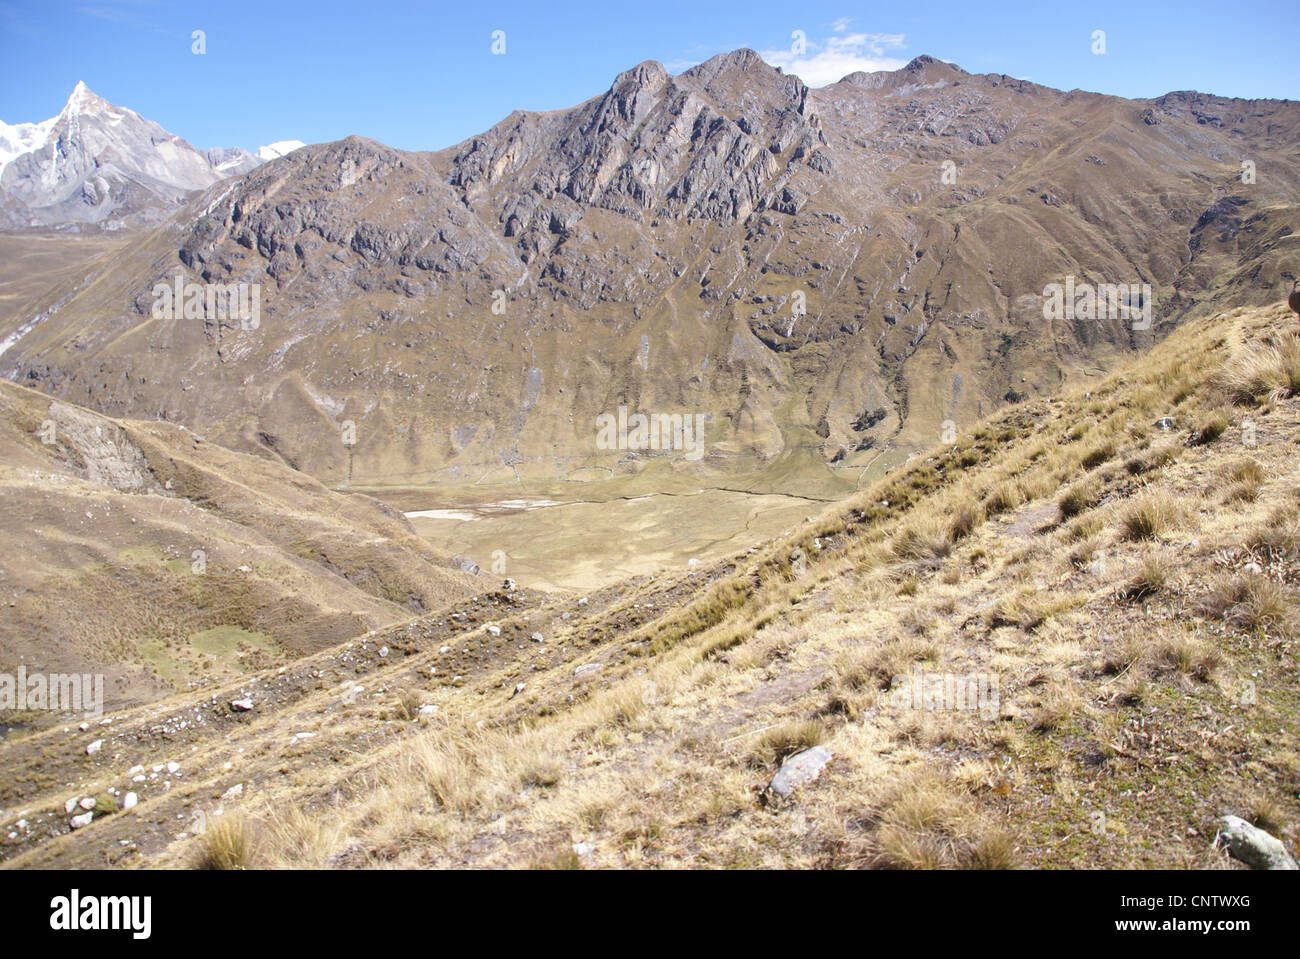 Wild mountain landscape in the Nevada Jurau Andes,Peru, South America - Stock Image